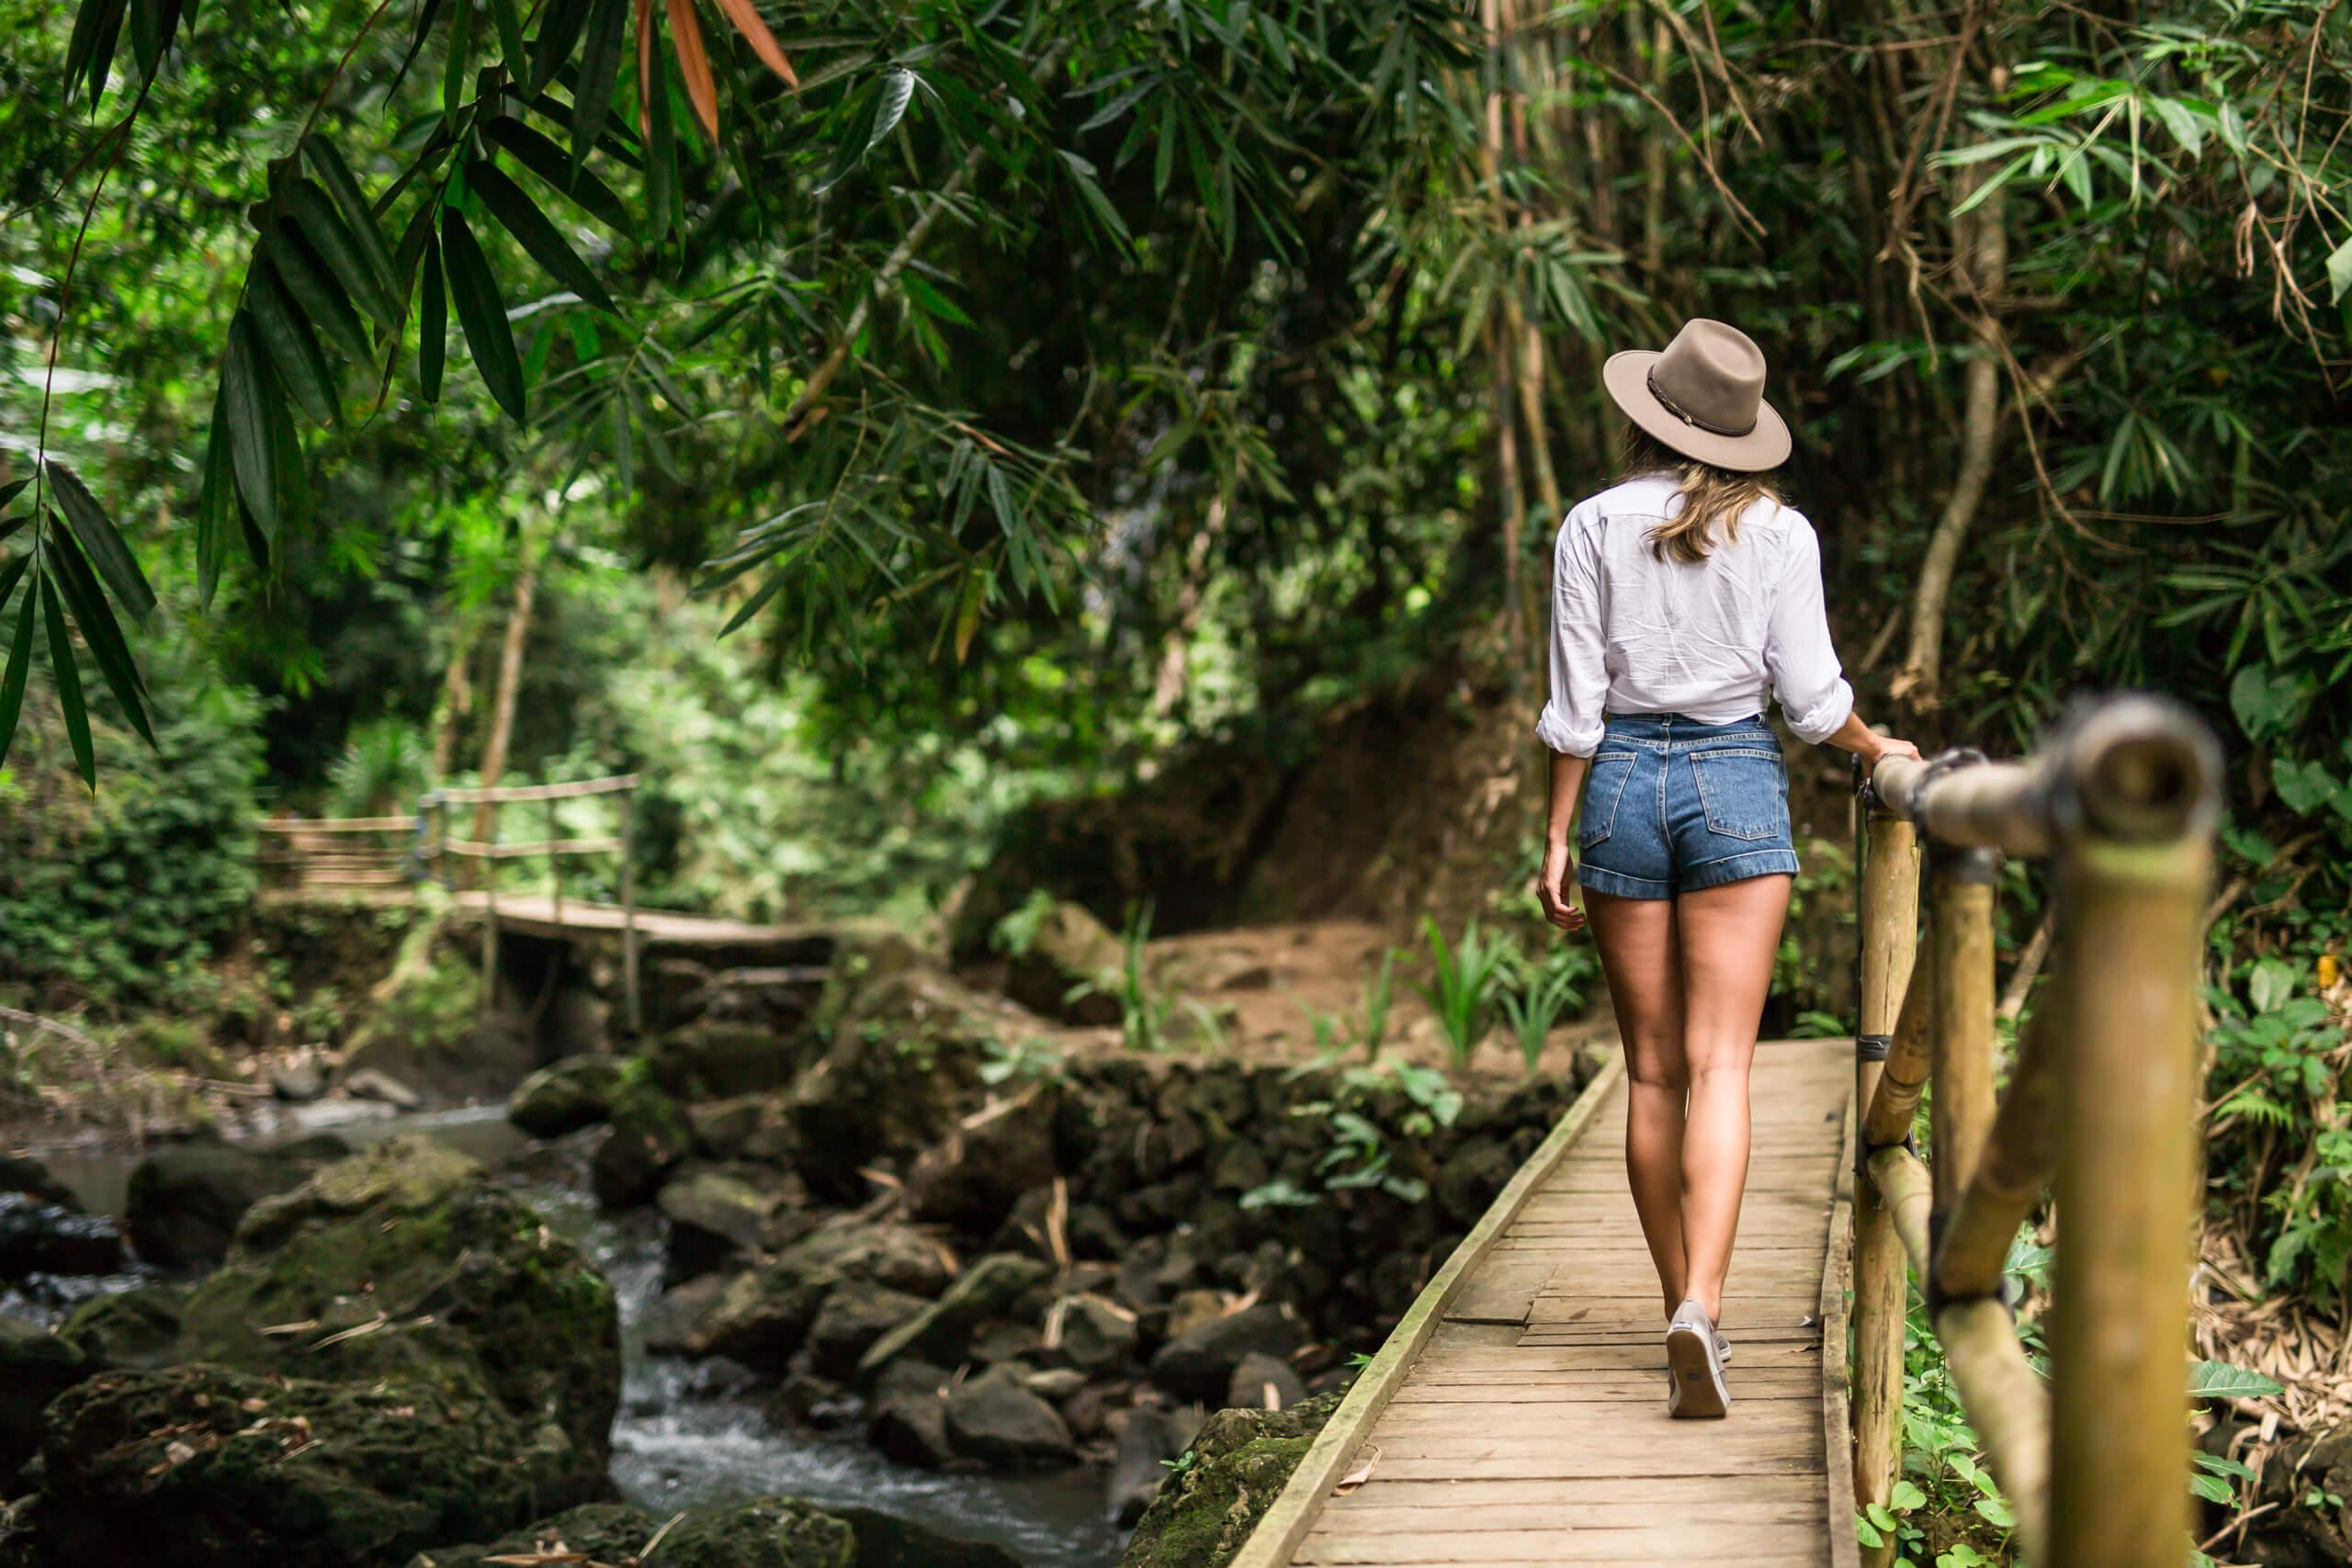 TIBUMANA WATERFALL | On the hunt for the hidden waterfall